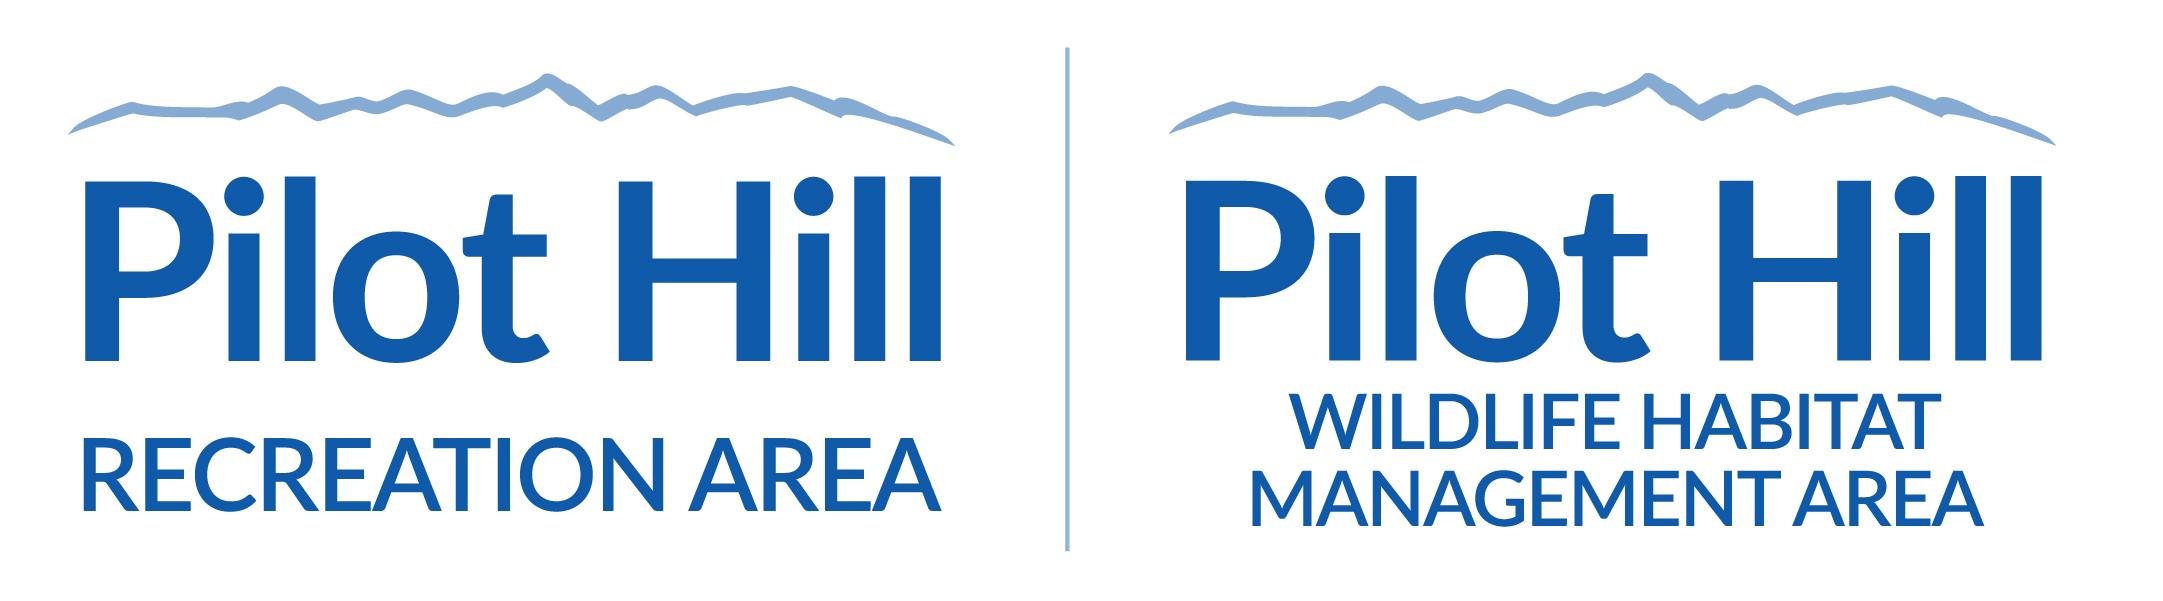 Pilot Hill Project